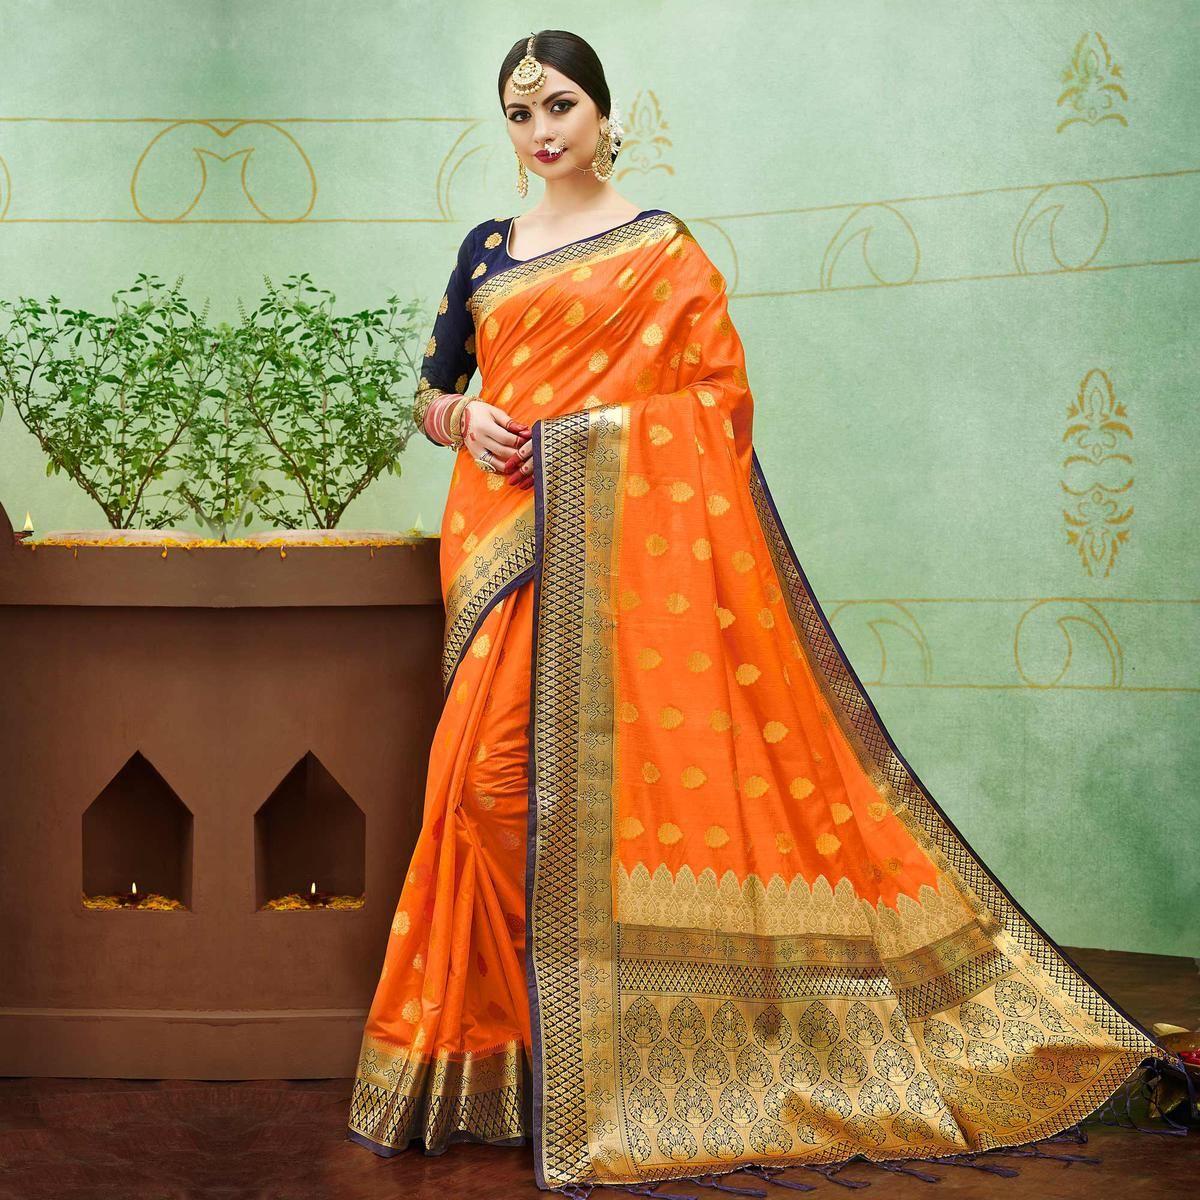 dc25485c8 Buy Orange-Blue Colored Designer Festive Wear Banarasi Silk Saree Online  India